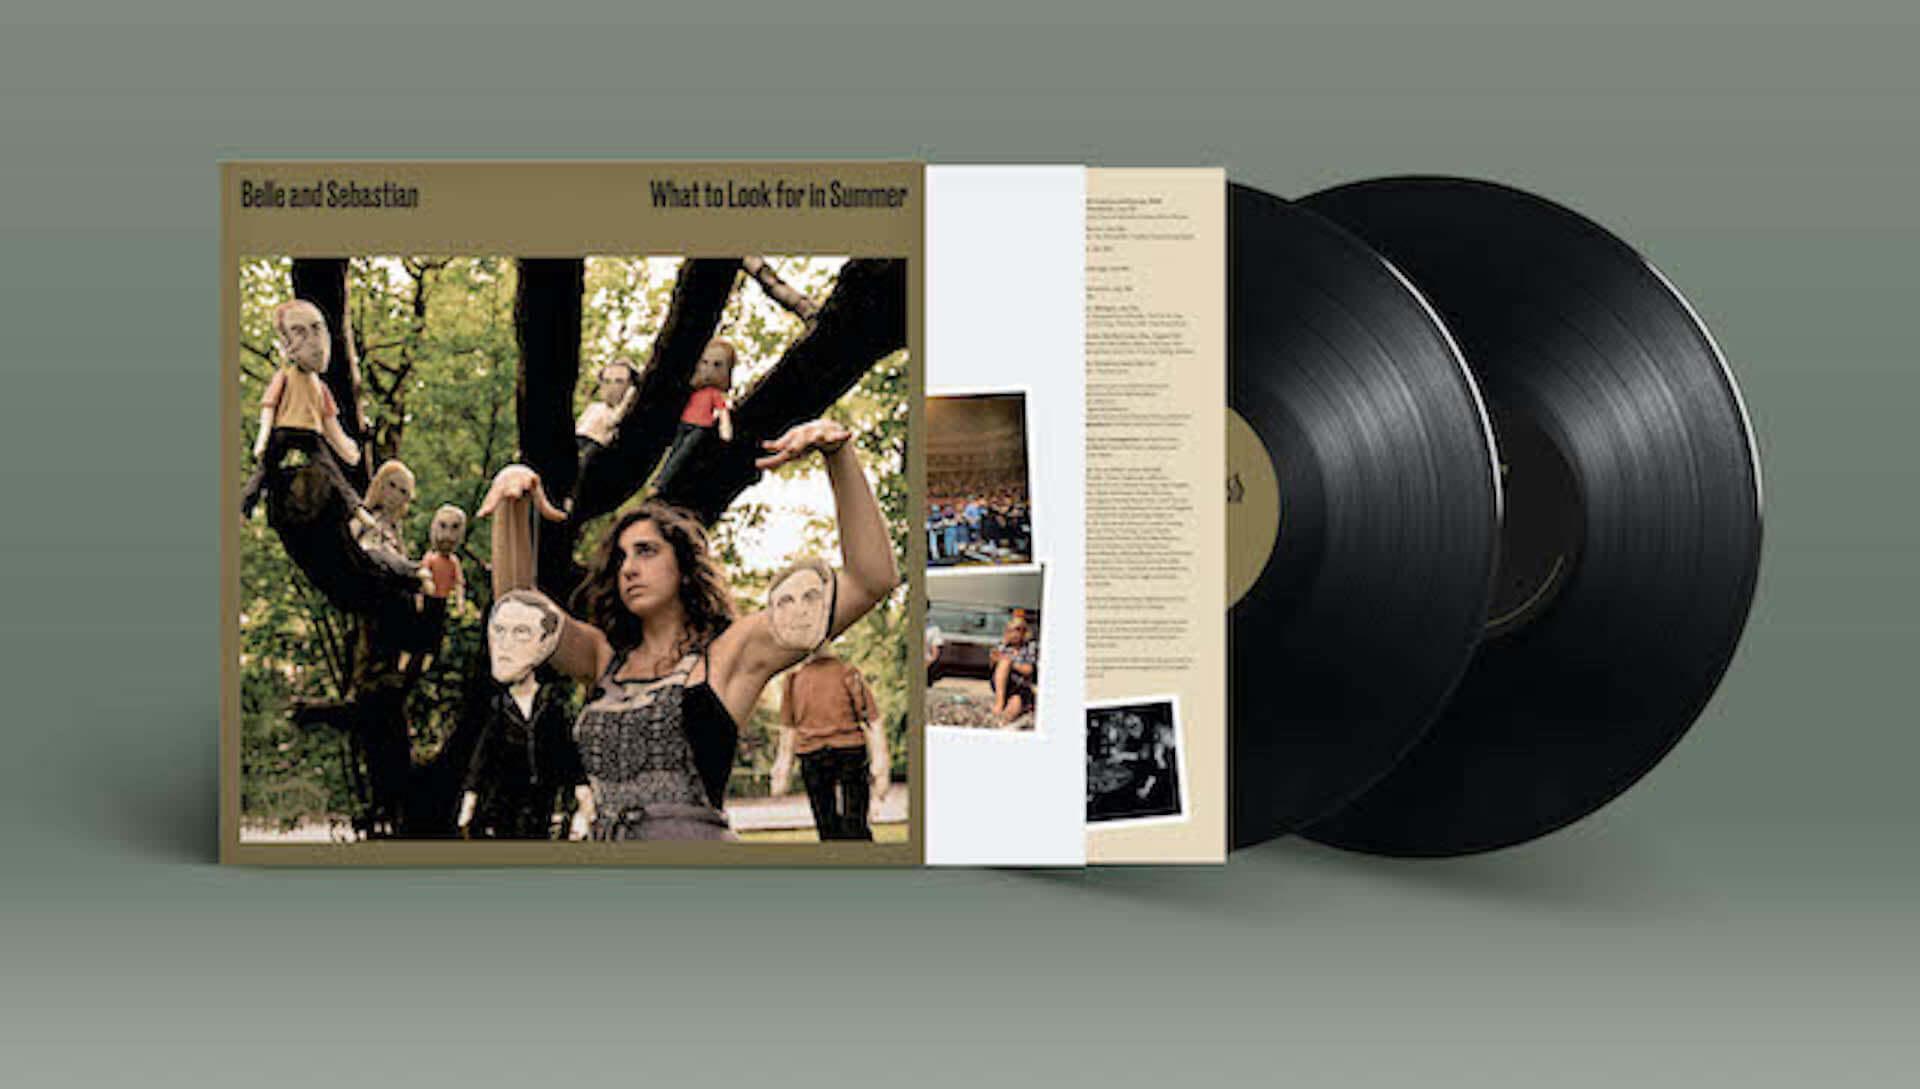 Belle and Sebastianの2枚組ライブ・ベスト盤『What To Look For In Summer』がCD&LPで発売決定!収録曲2曲のMVも公開 music201028_belle-and-sebastian_3-1920x1089